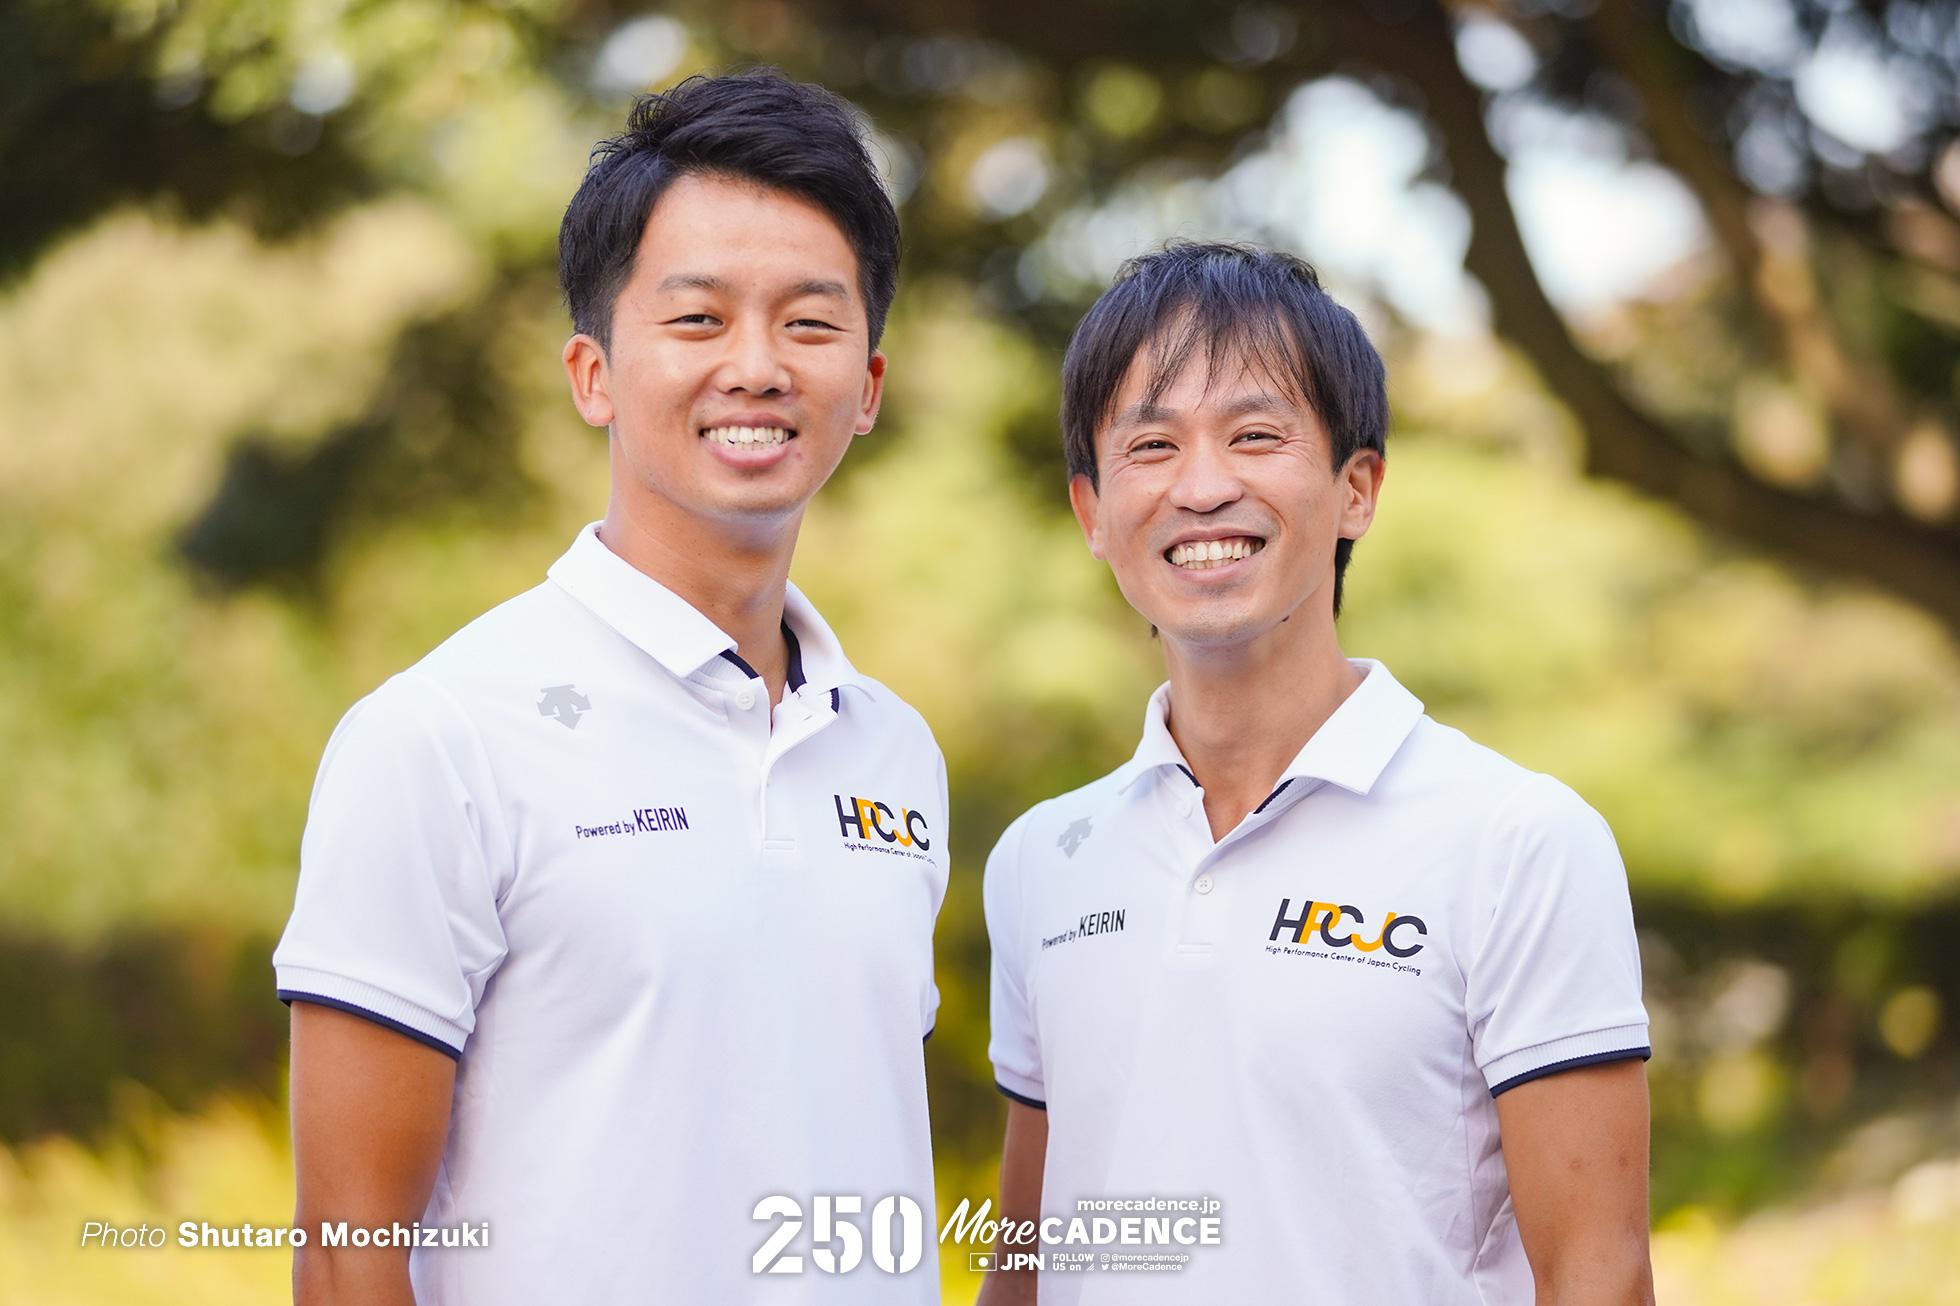 中山真臣/井上純爾, HPCJC医療スタッフ